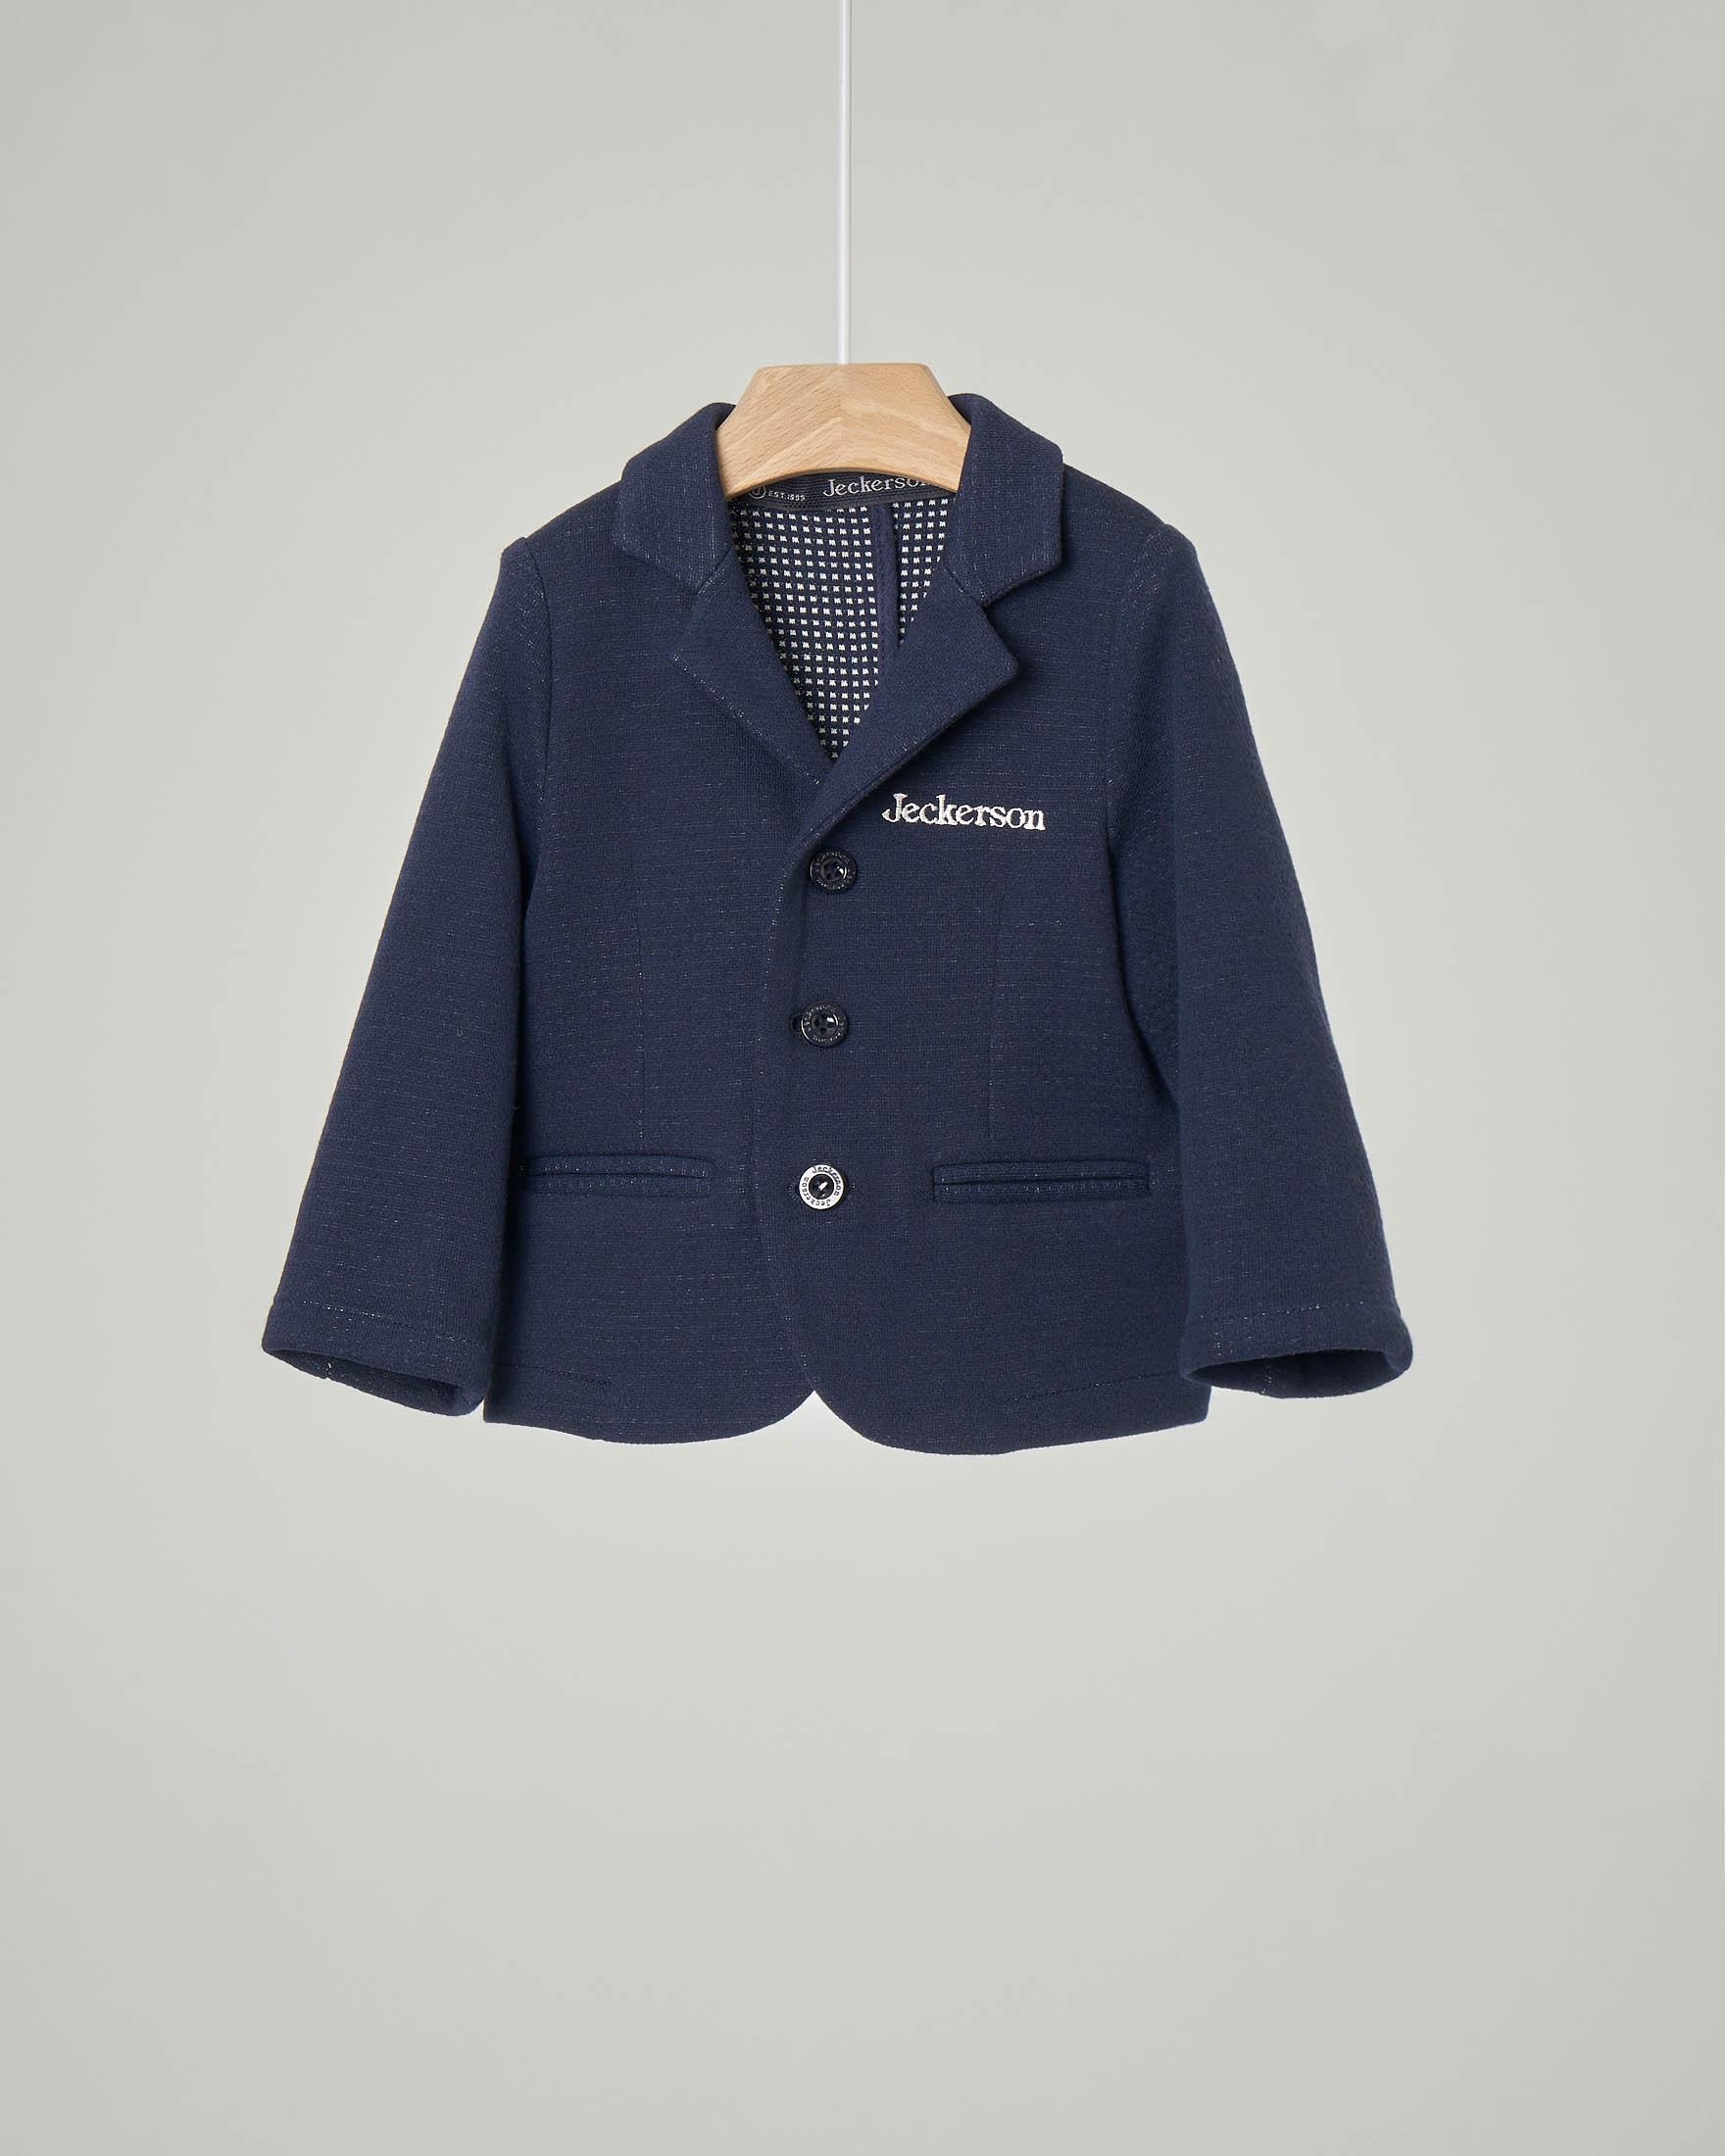 Giacca blu in felpa con chiusura a tre bottoni 6-18 mesi